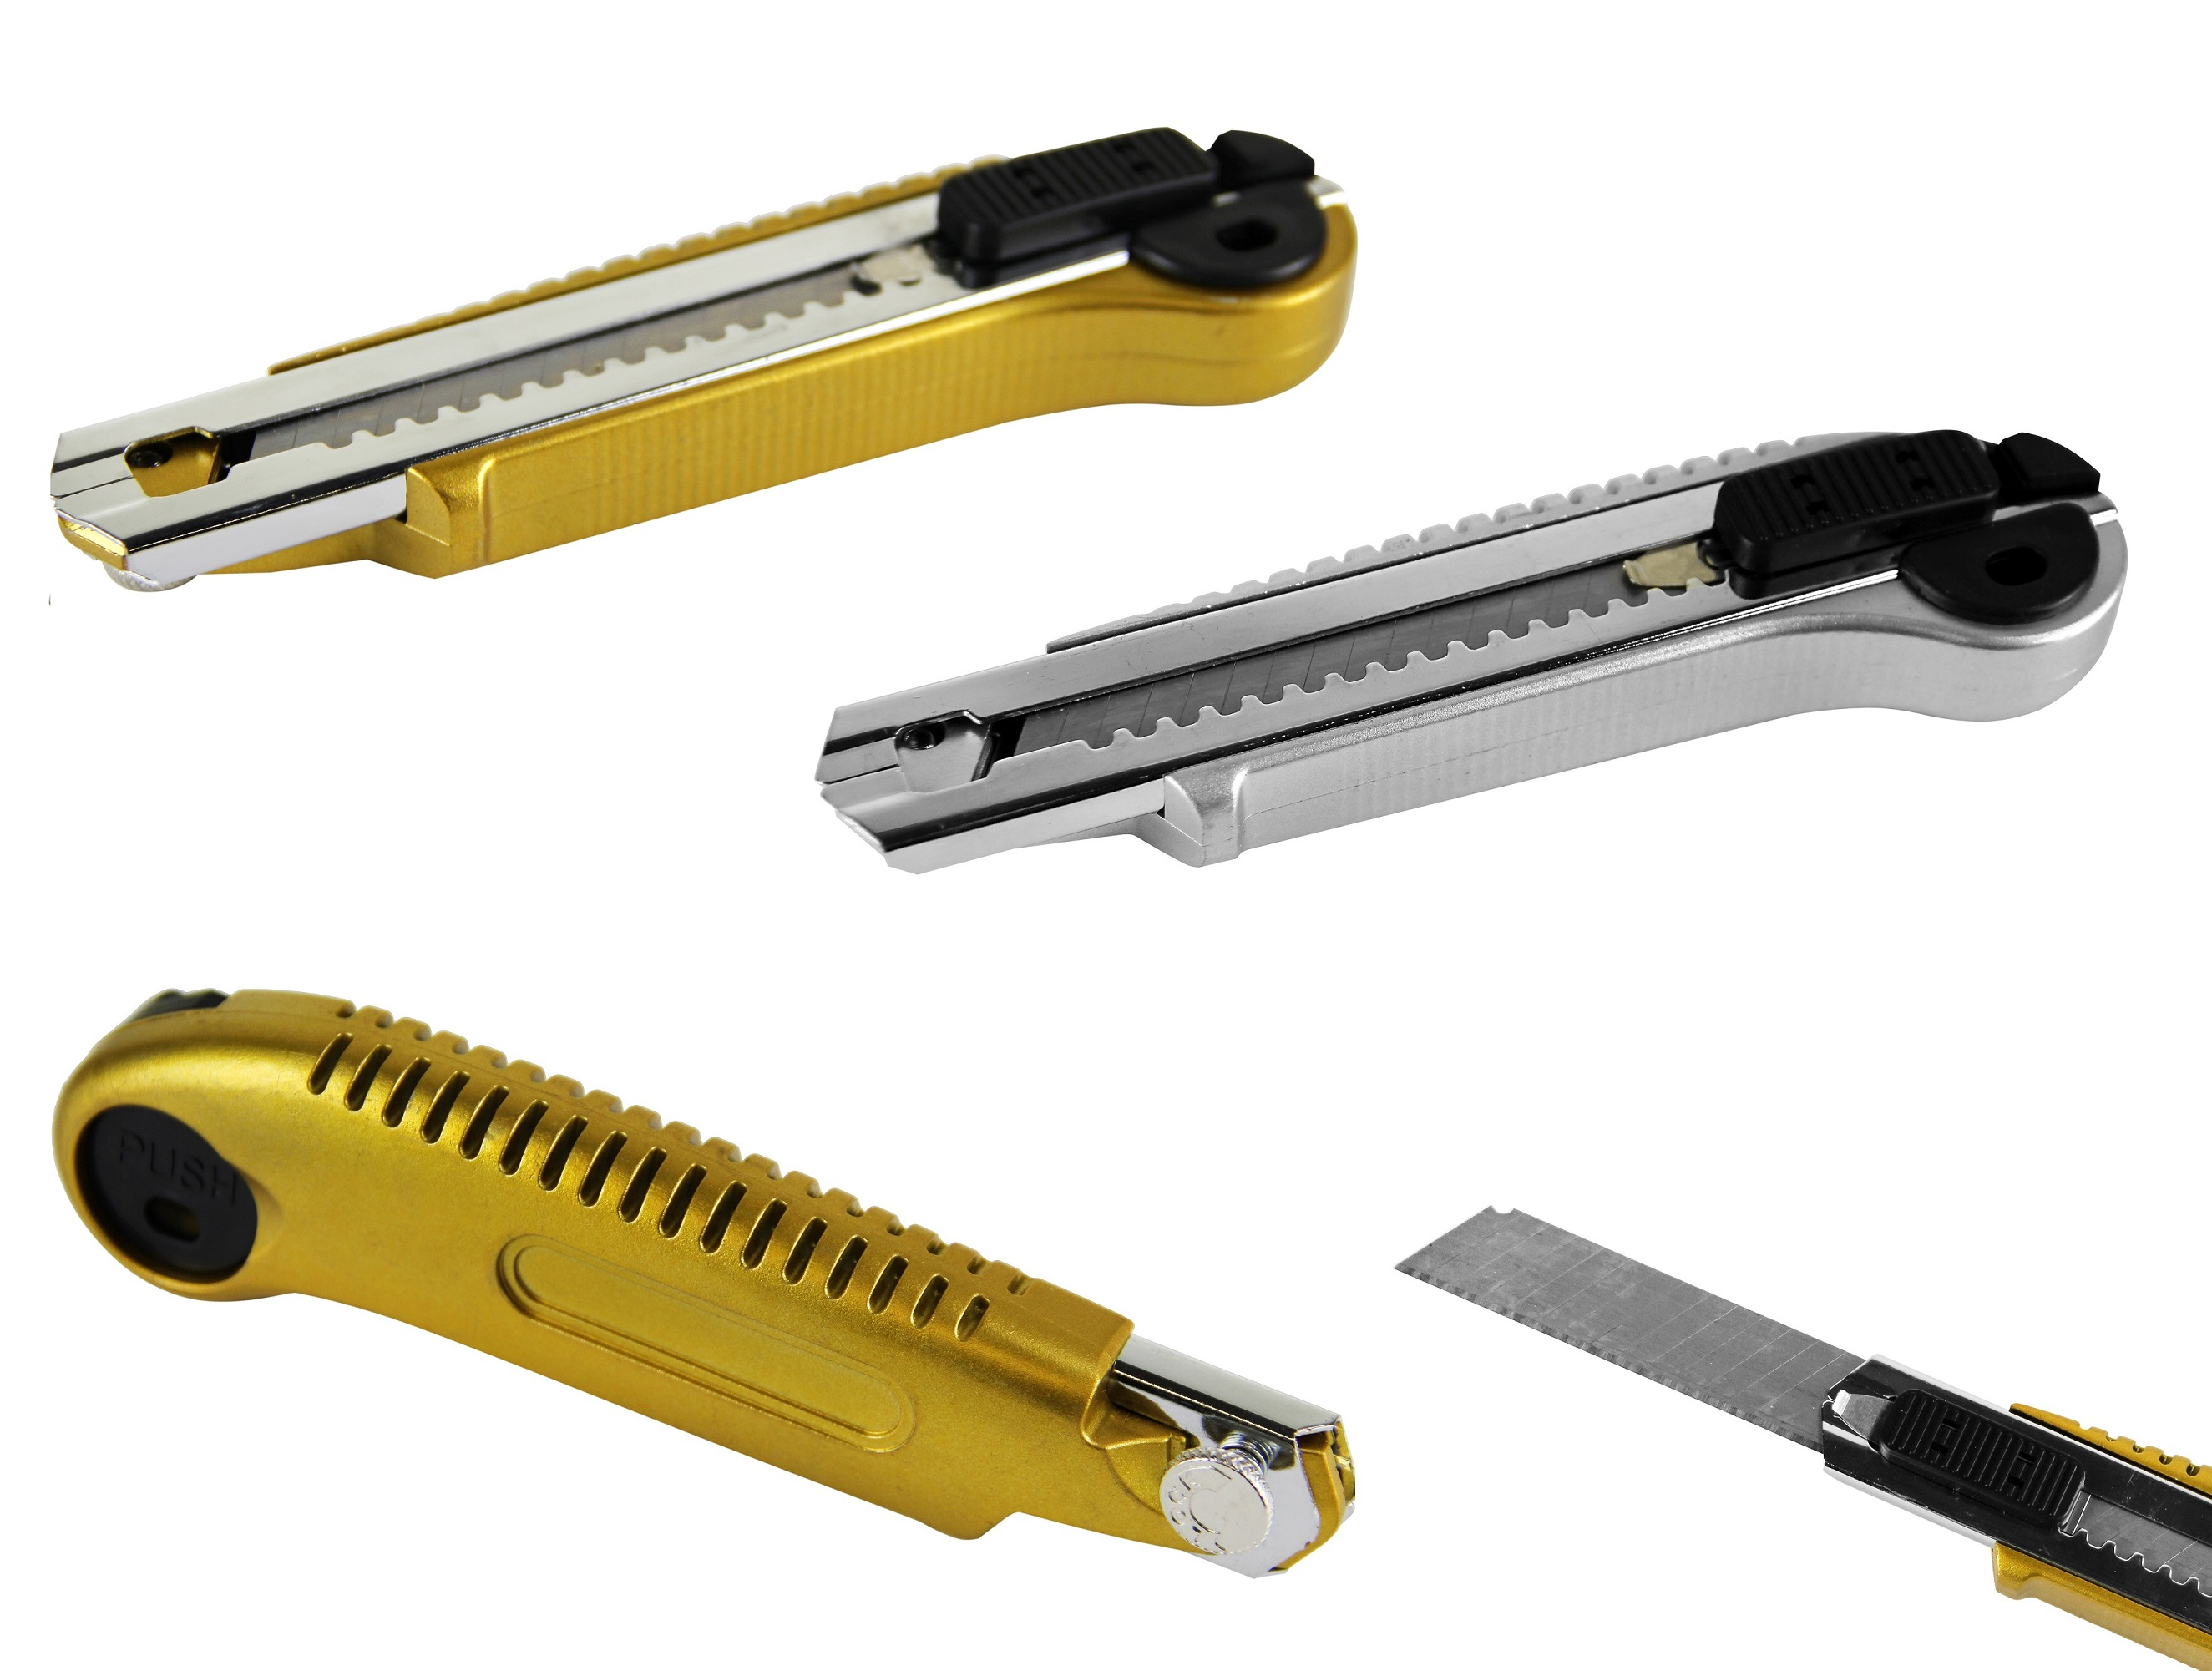 Cuttermesser 18mm Arretierung über Drehrad Cutter Teppich Messer PRO